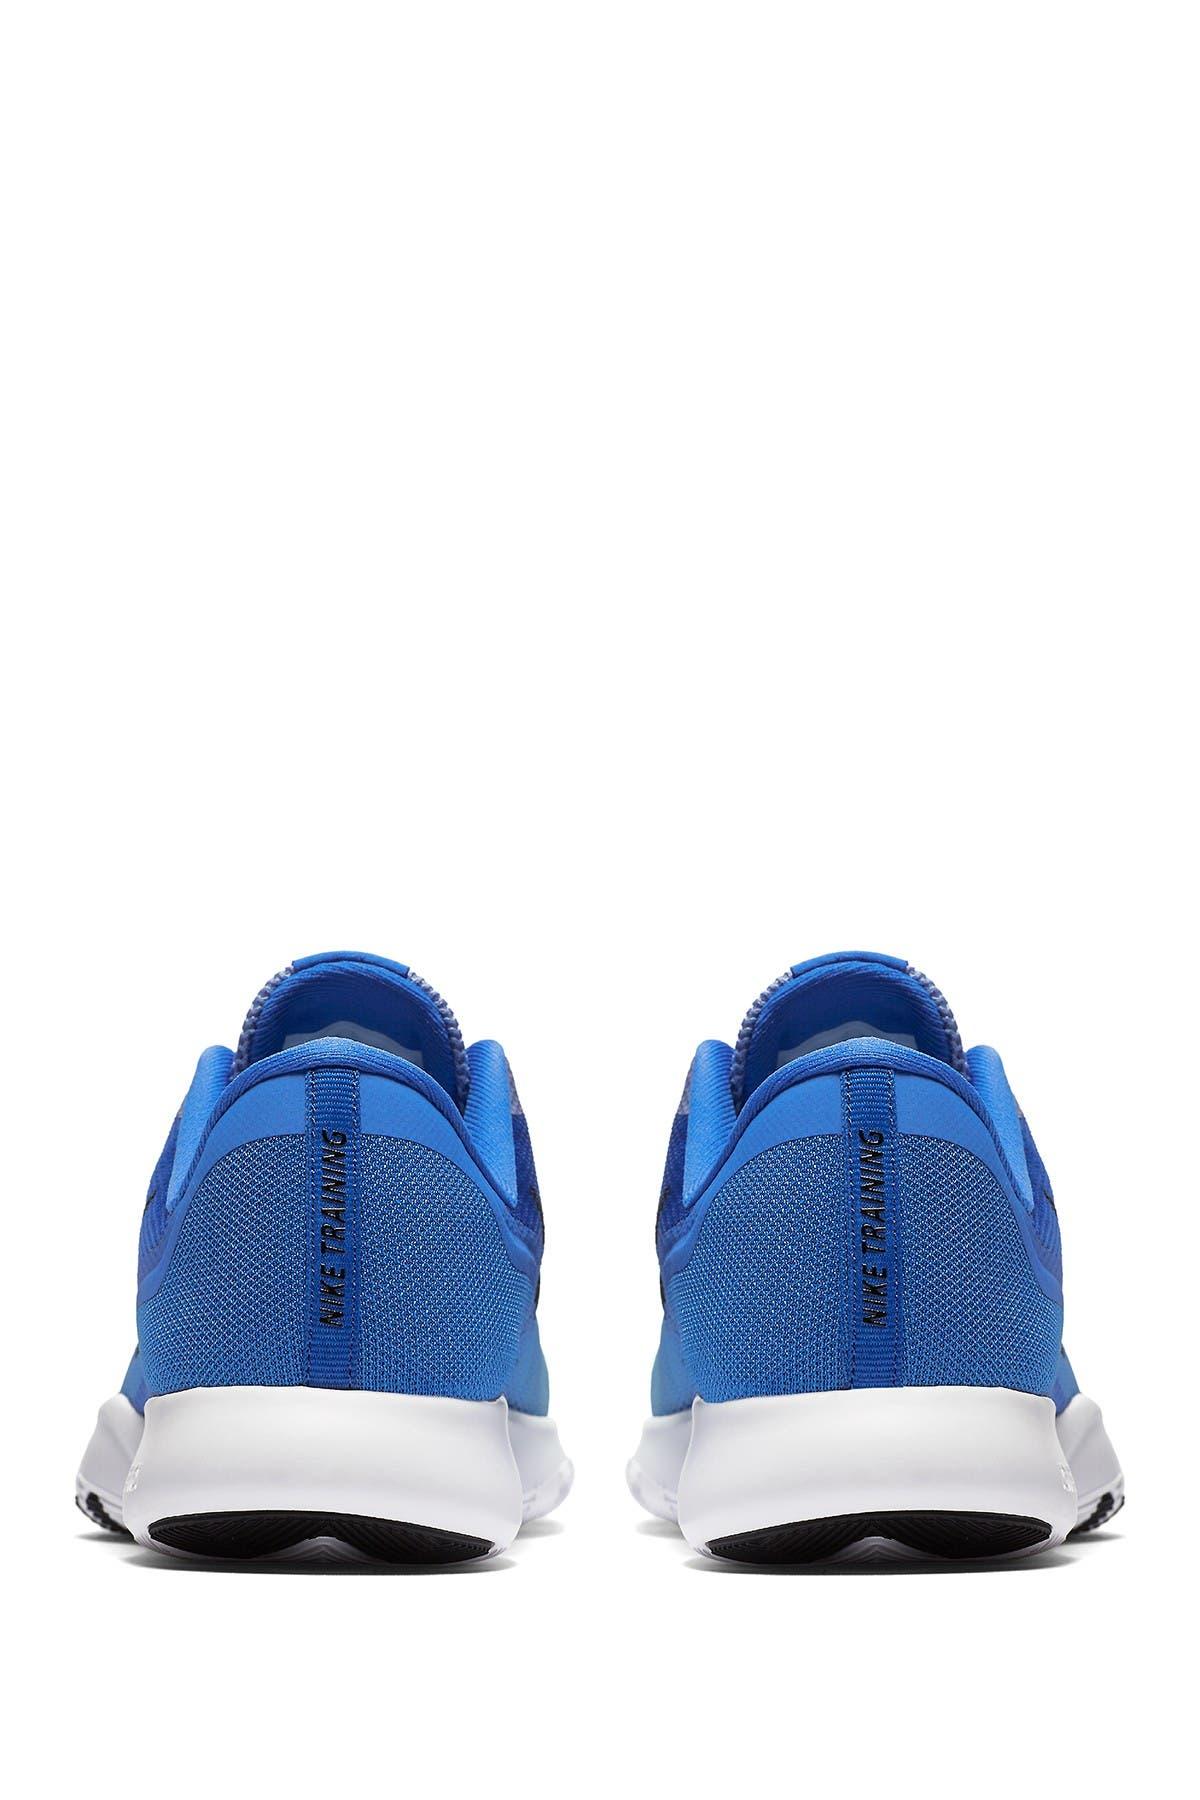 Nike | Free Form TR Fade Sneaker